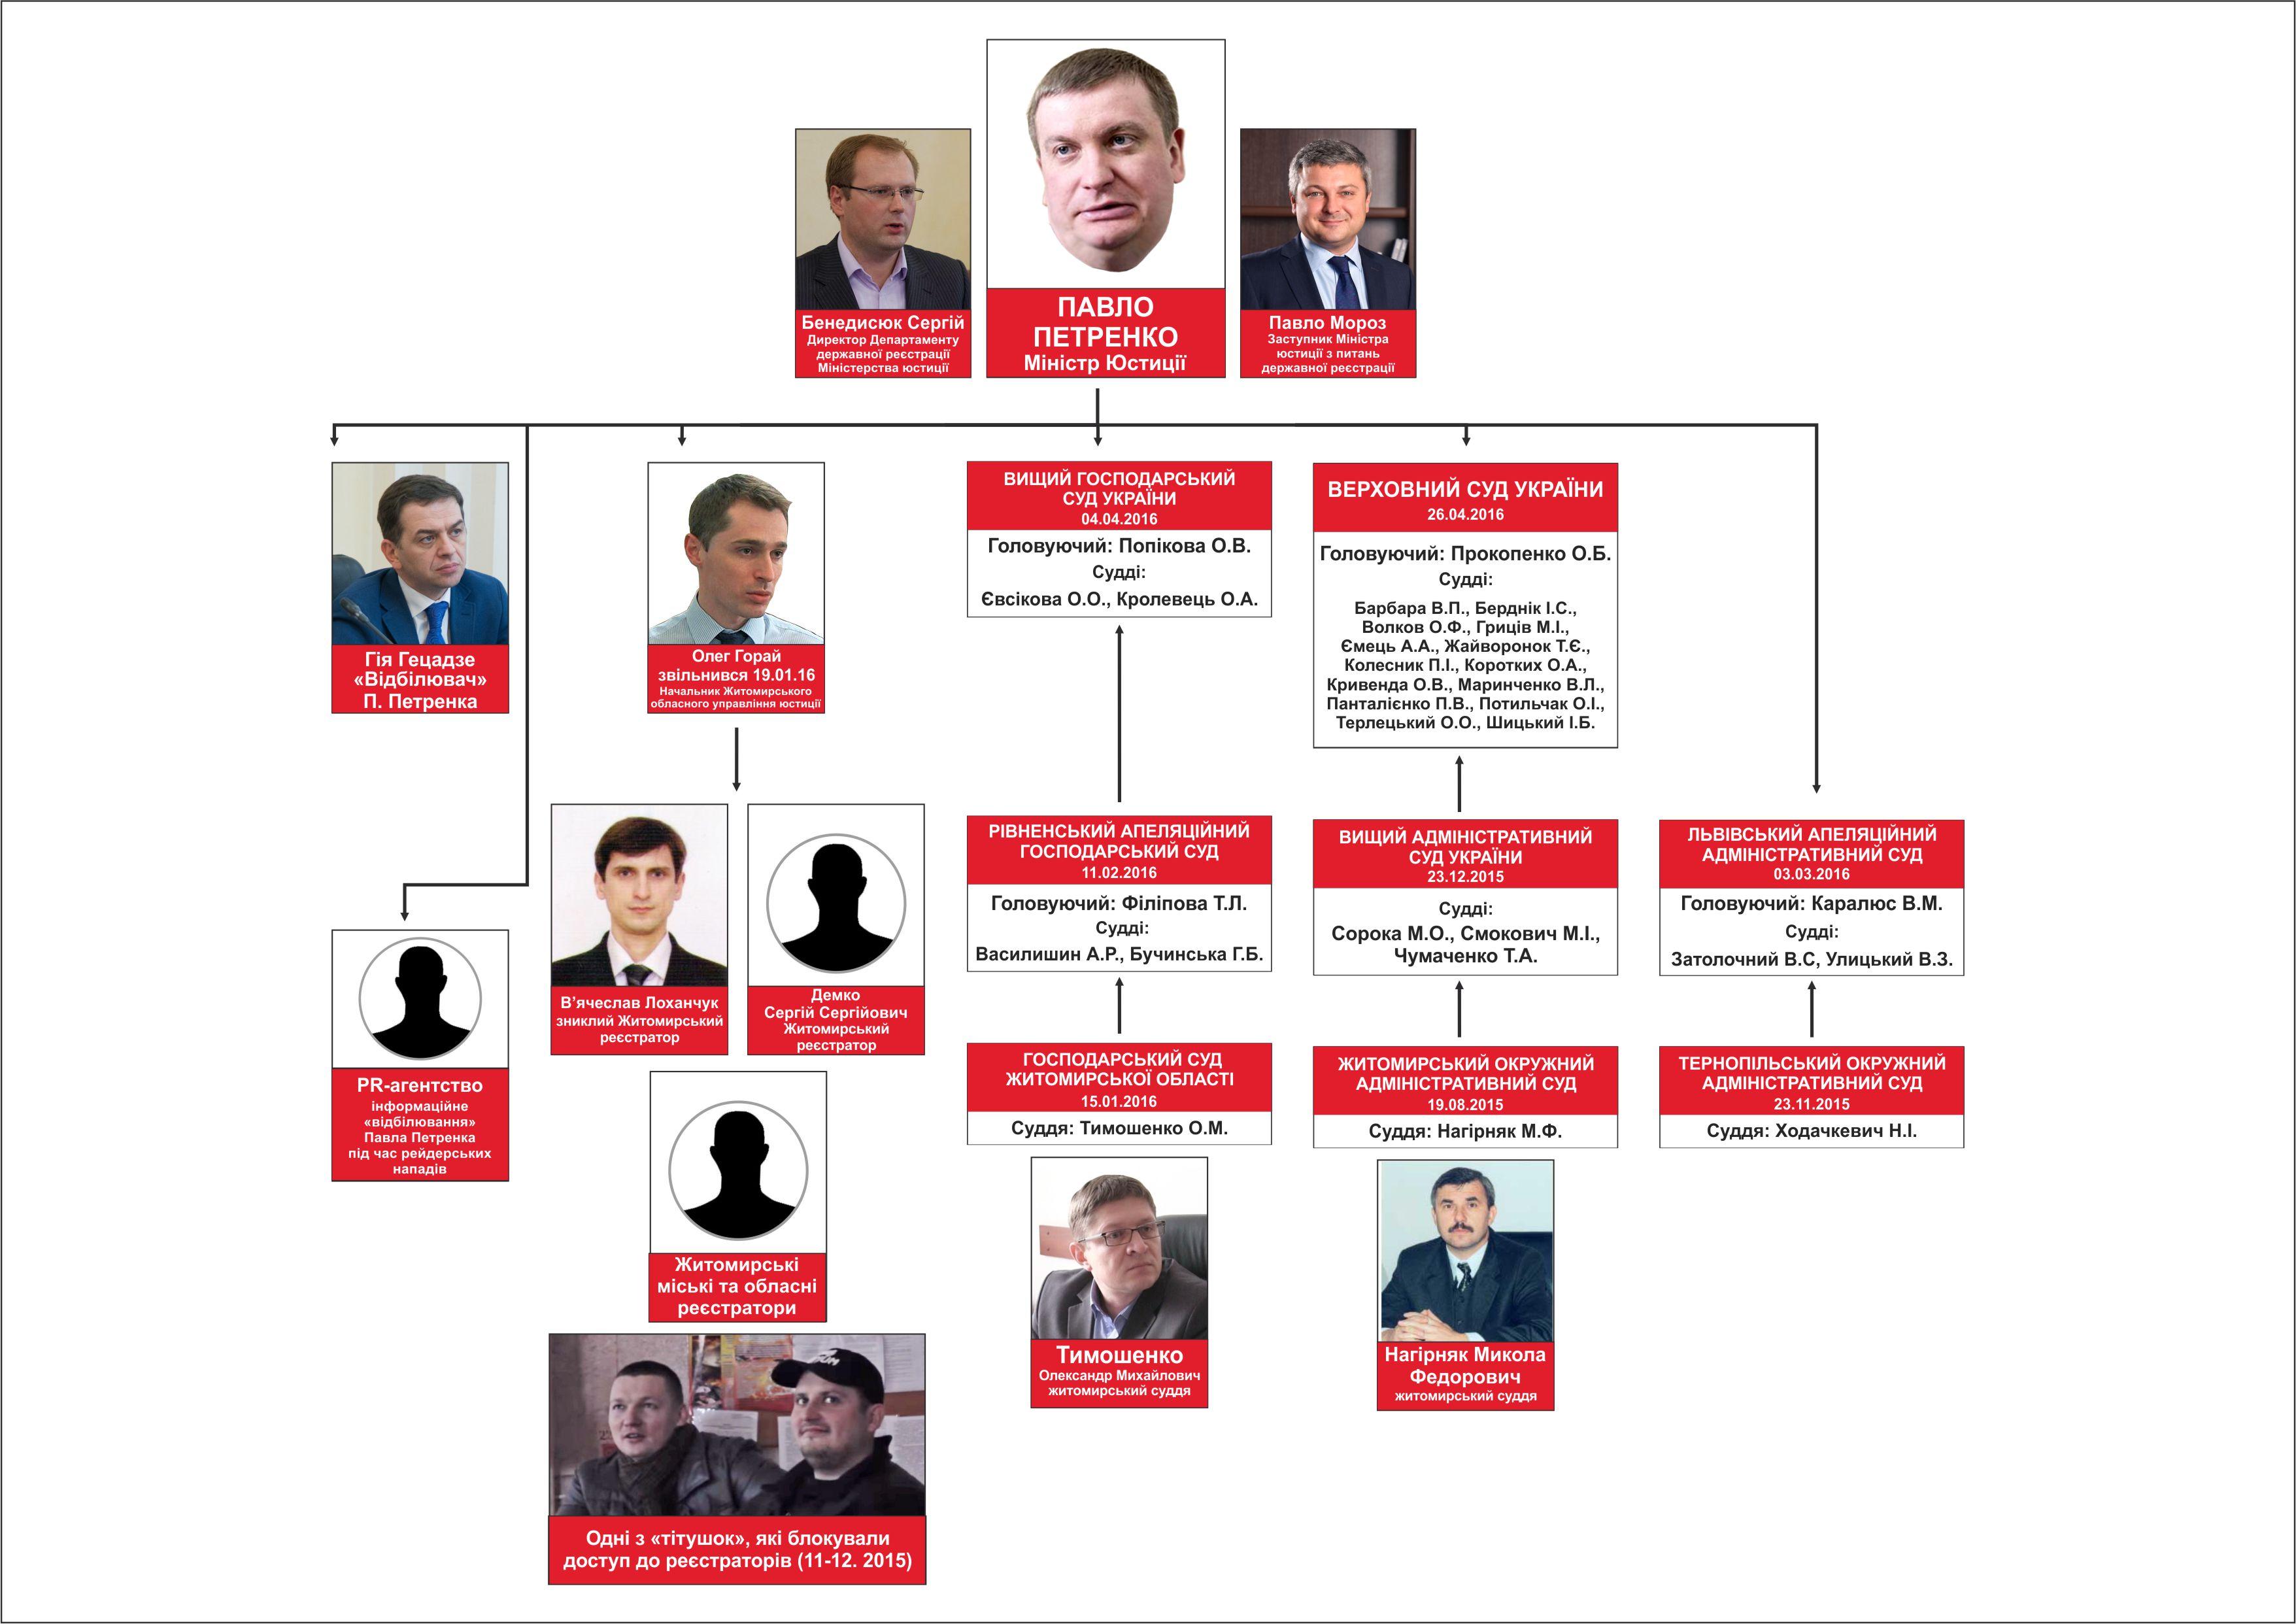 Структура кондитерської мафії в Україні